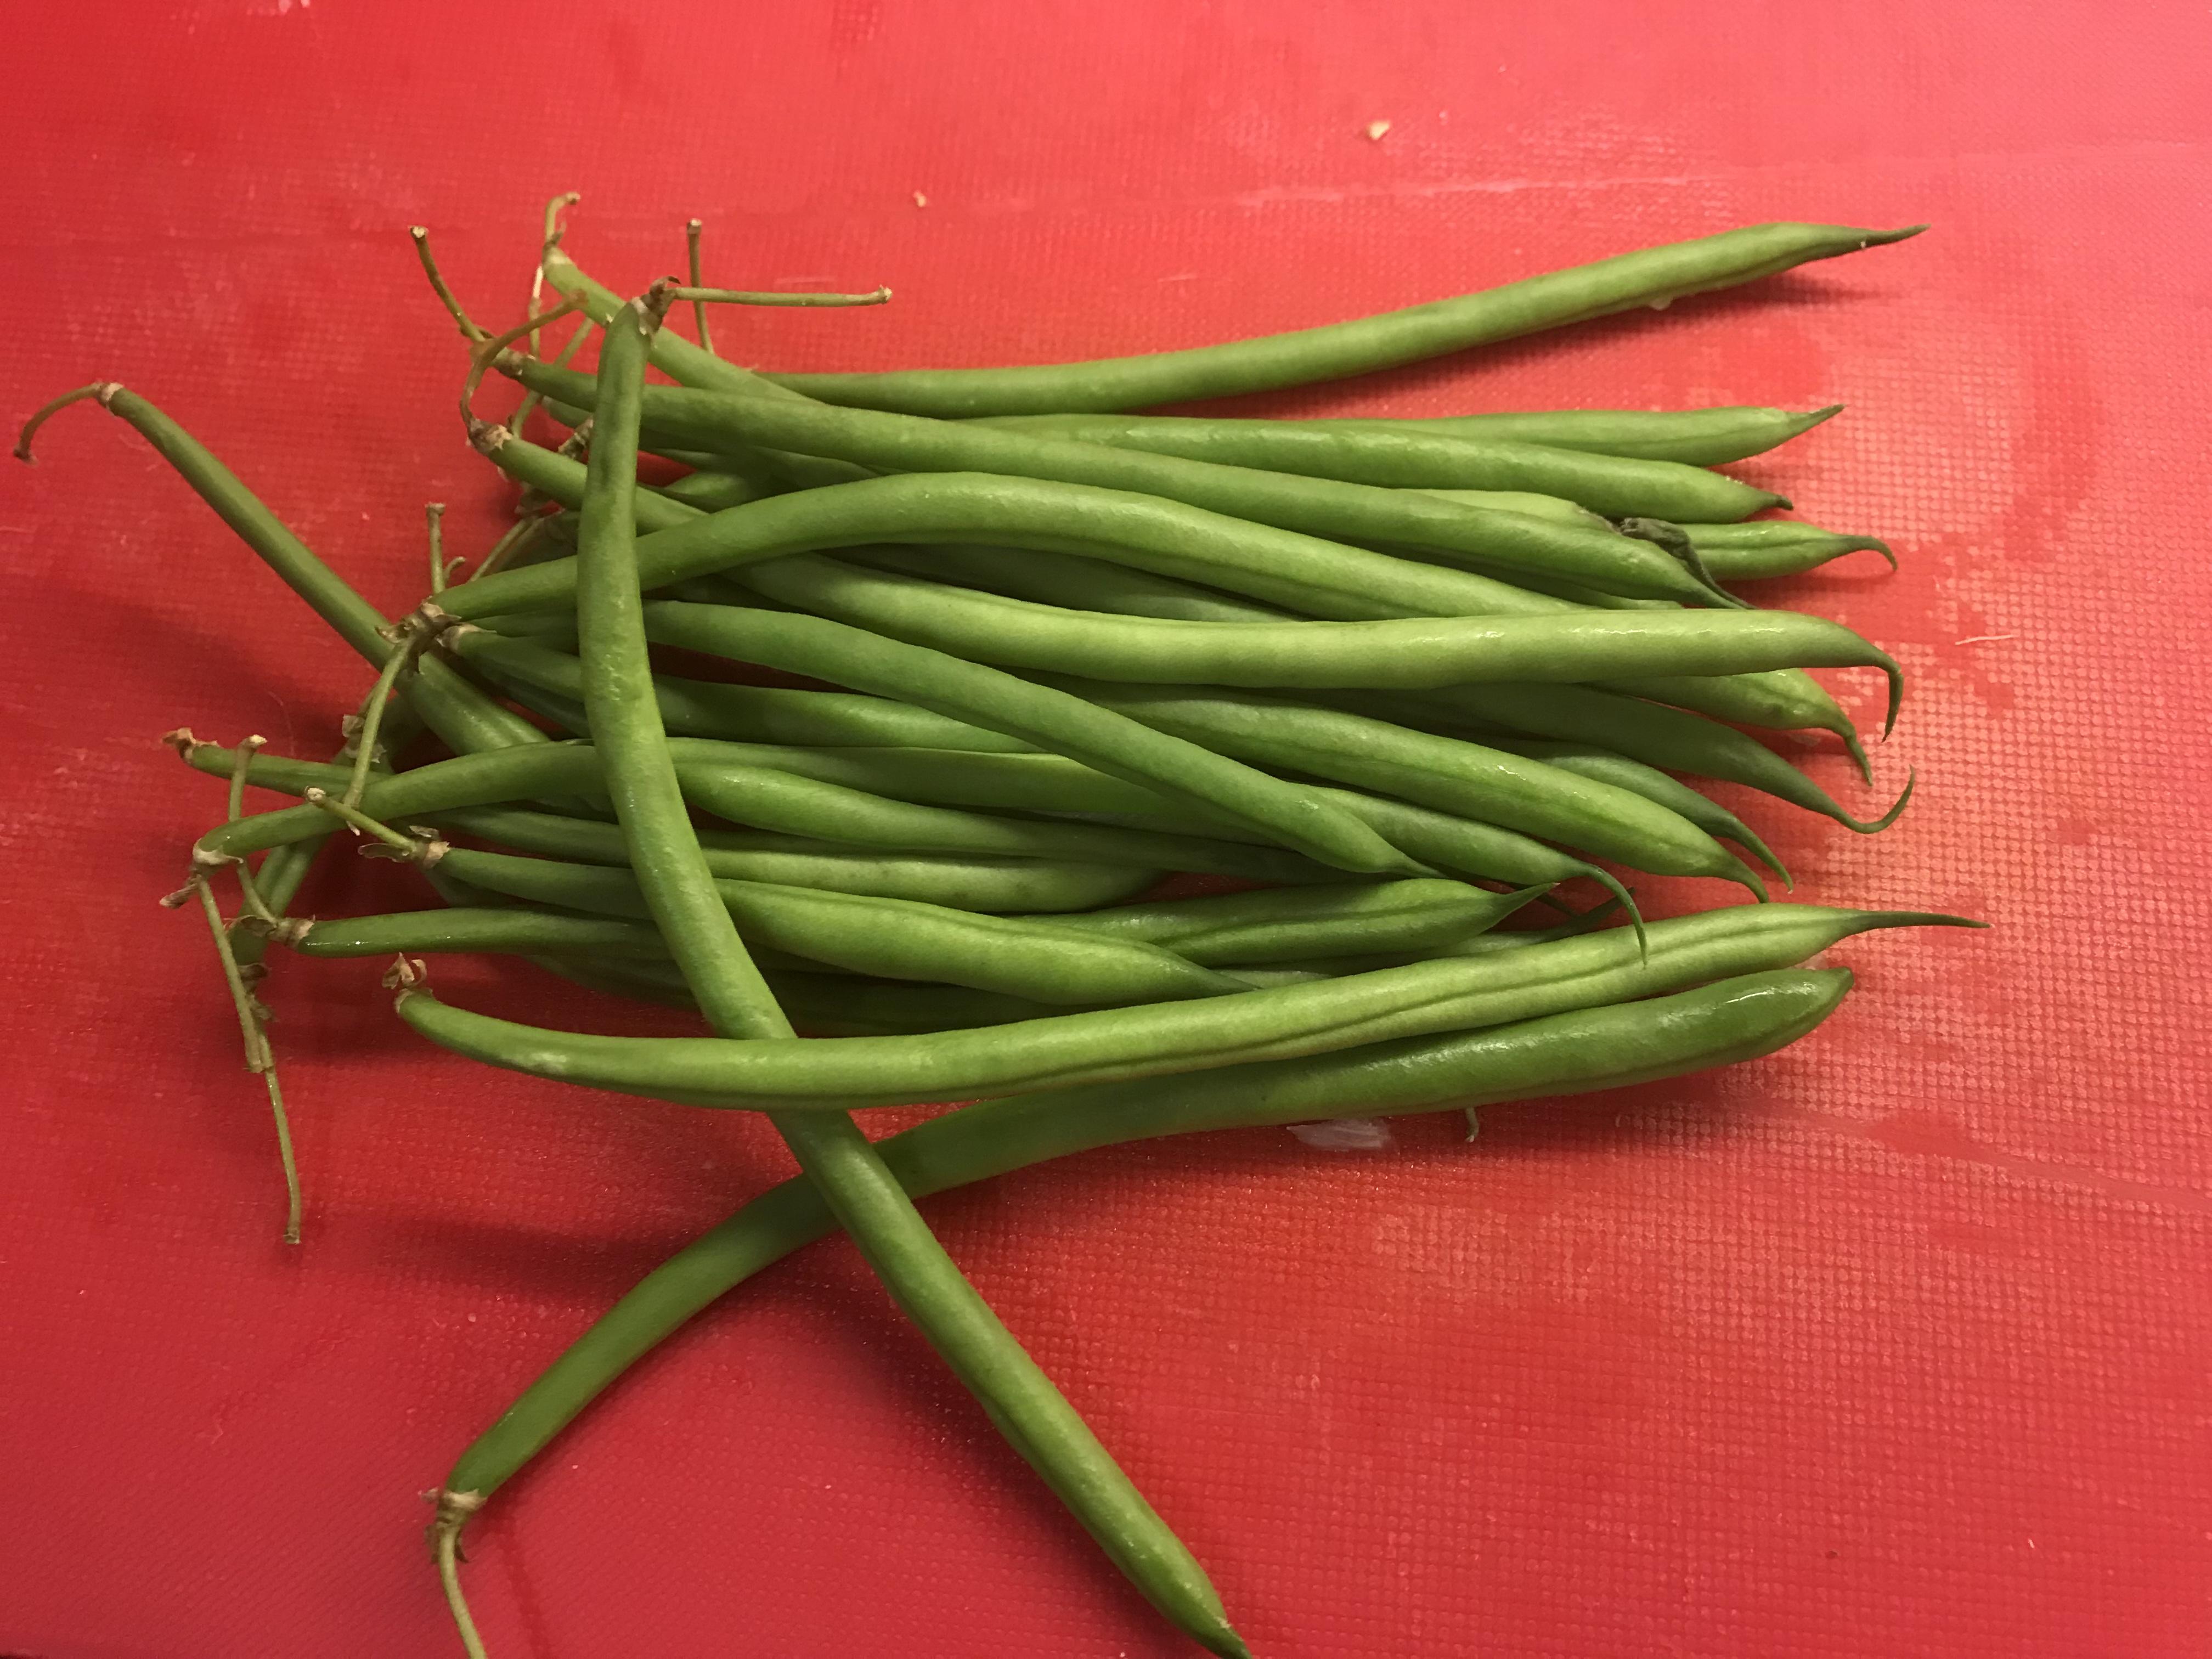 Ingredient of the Week: Green Beans